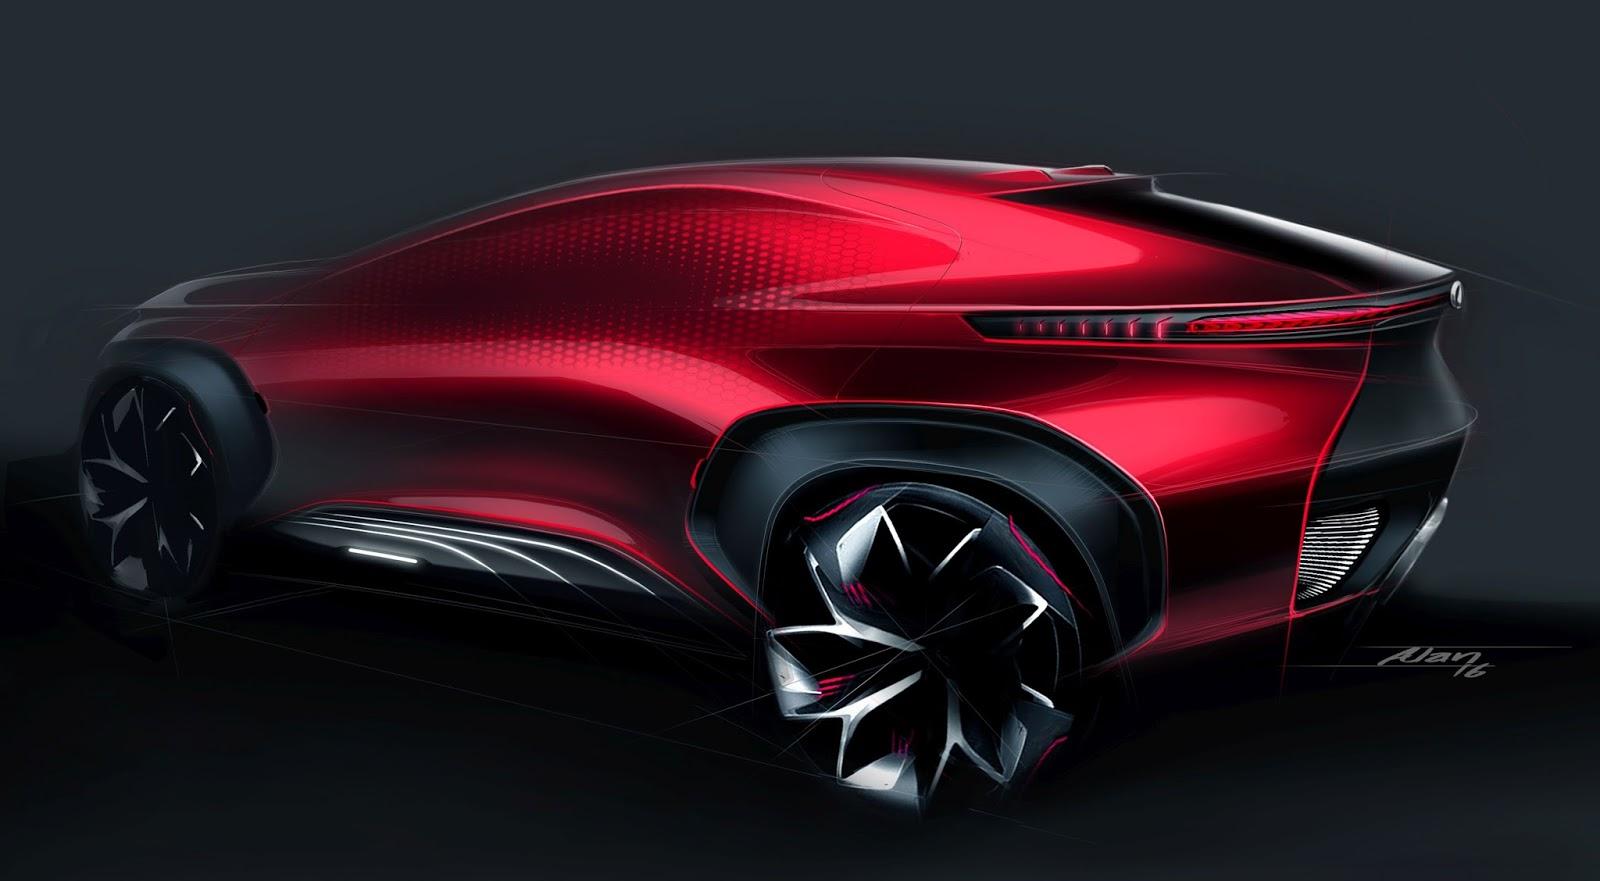 2016 Chery Fv2030 Concepts